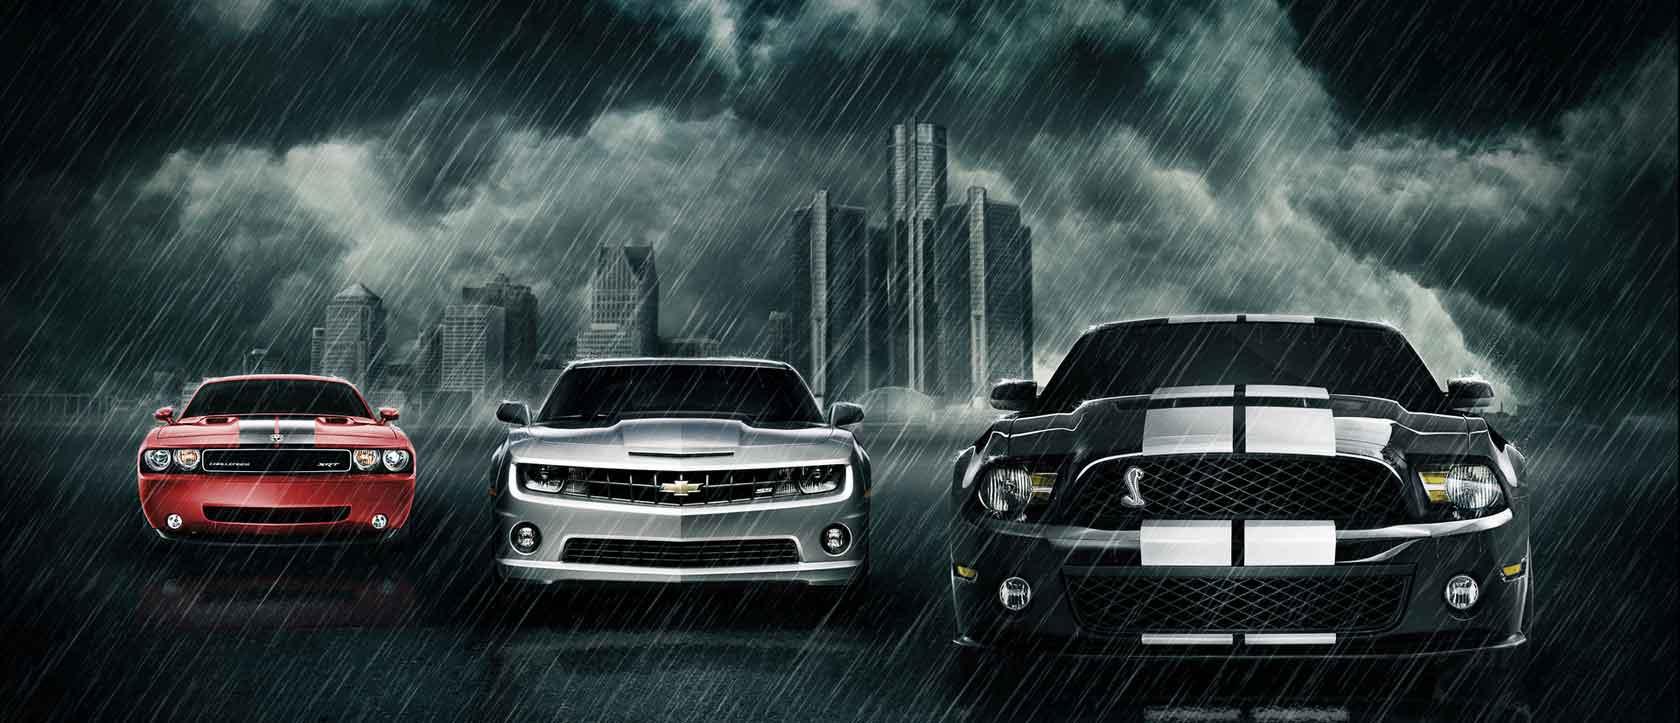 Beautiful Cars Wallpapers Top Free Beautiful Cars Backgrounds Wallpaperaccess